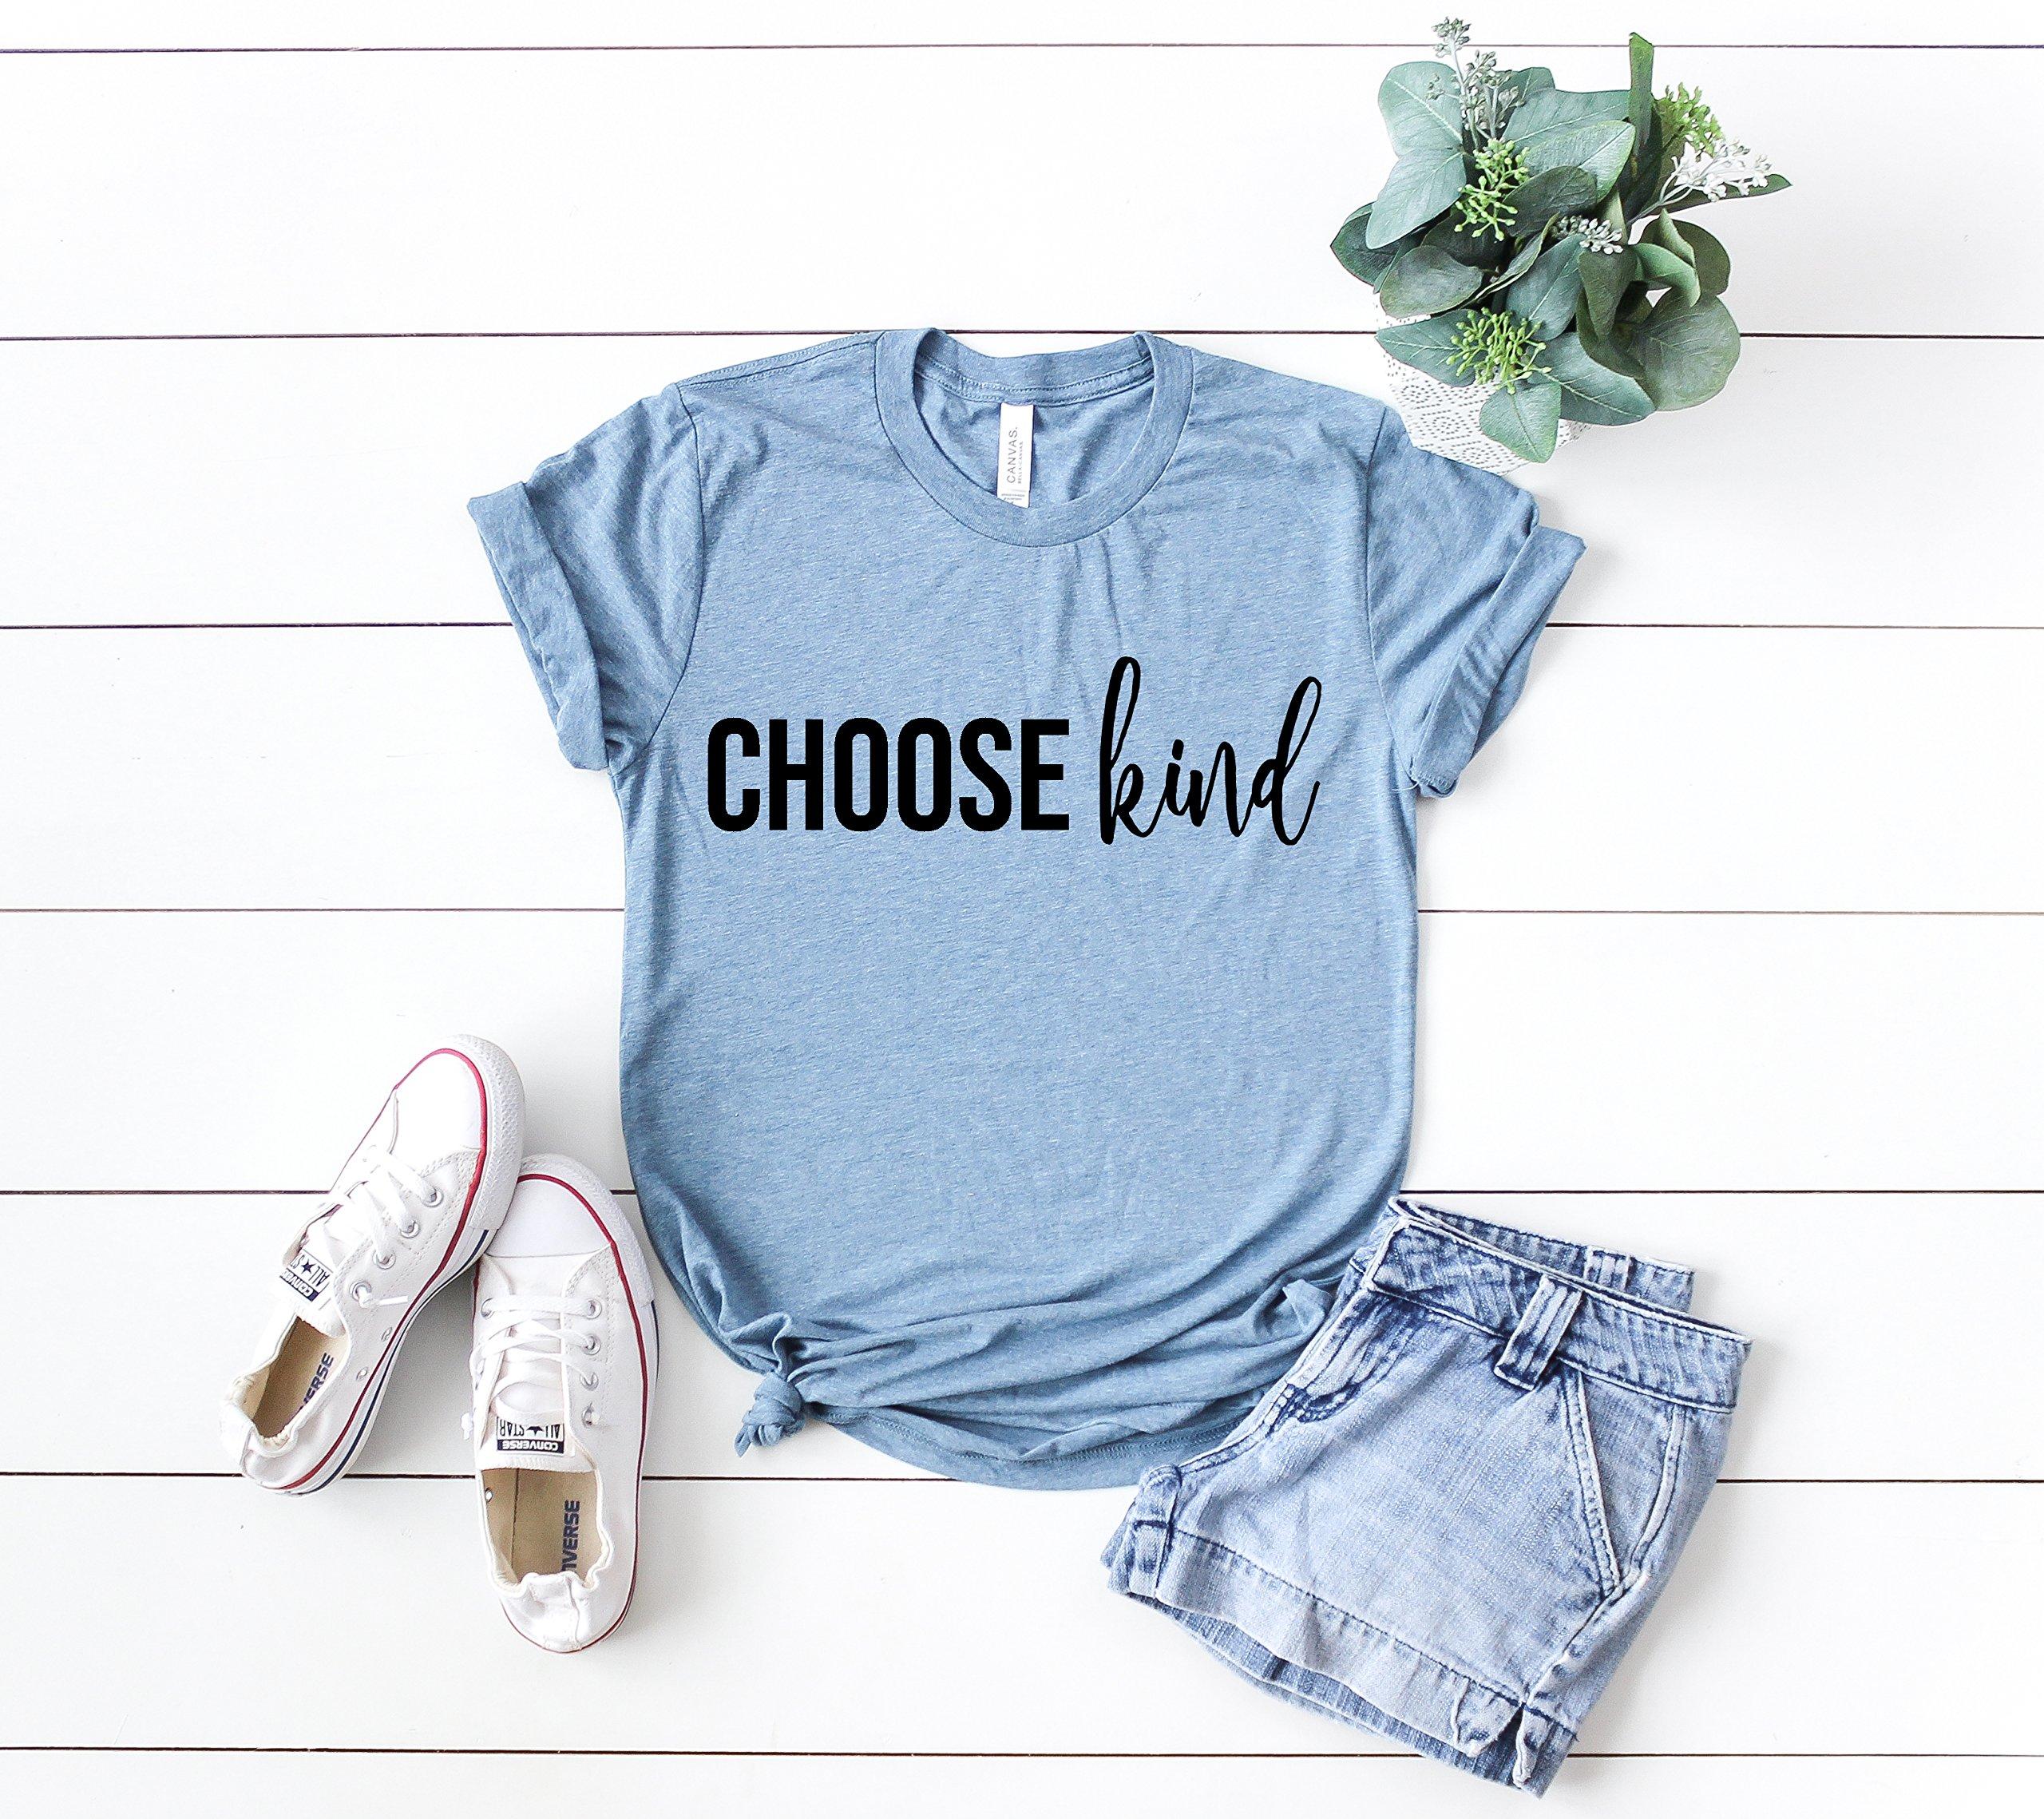 kind shirt kindness tee kindness is contagious positive tshirt choose kind be kind tshirt